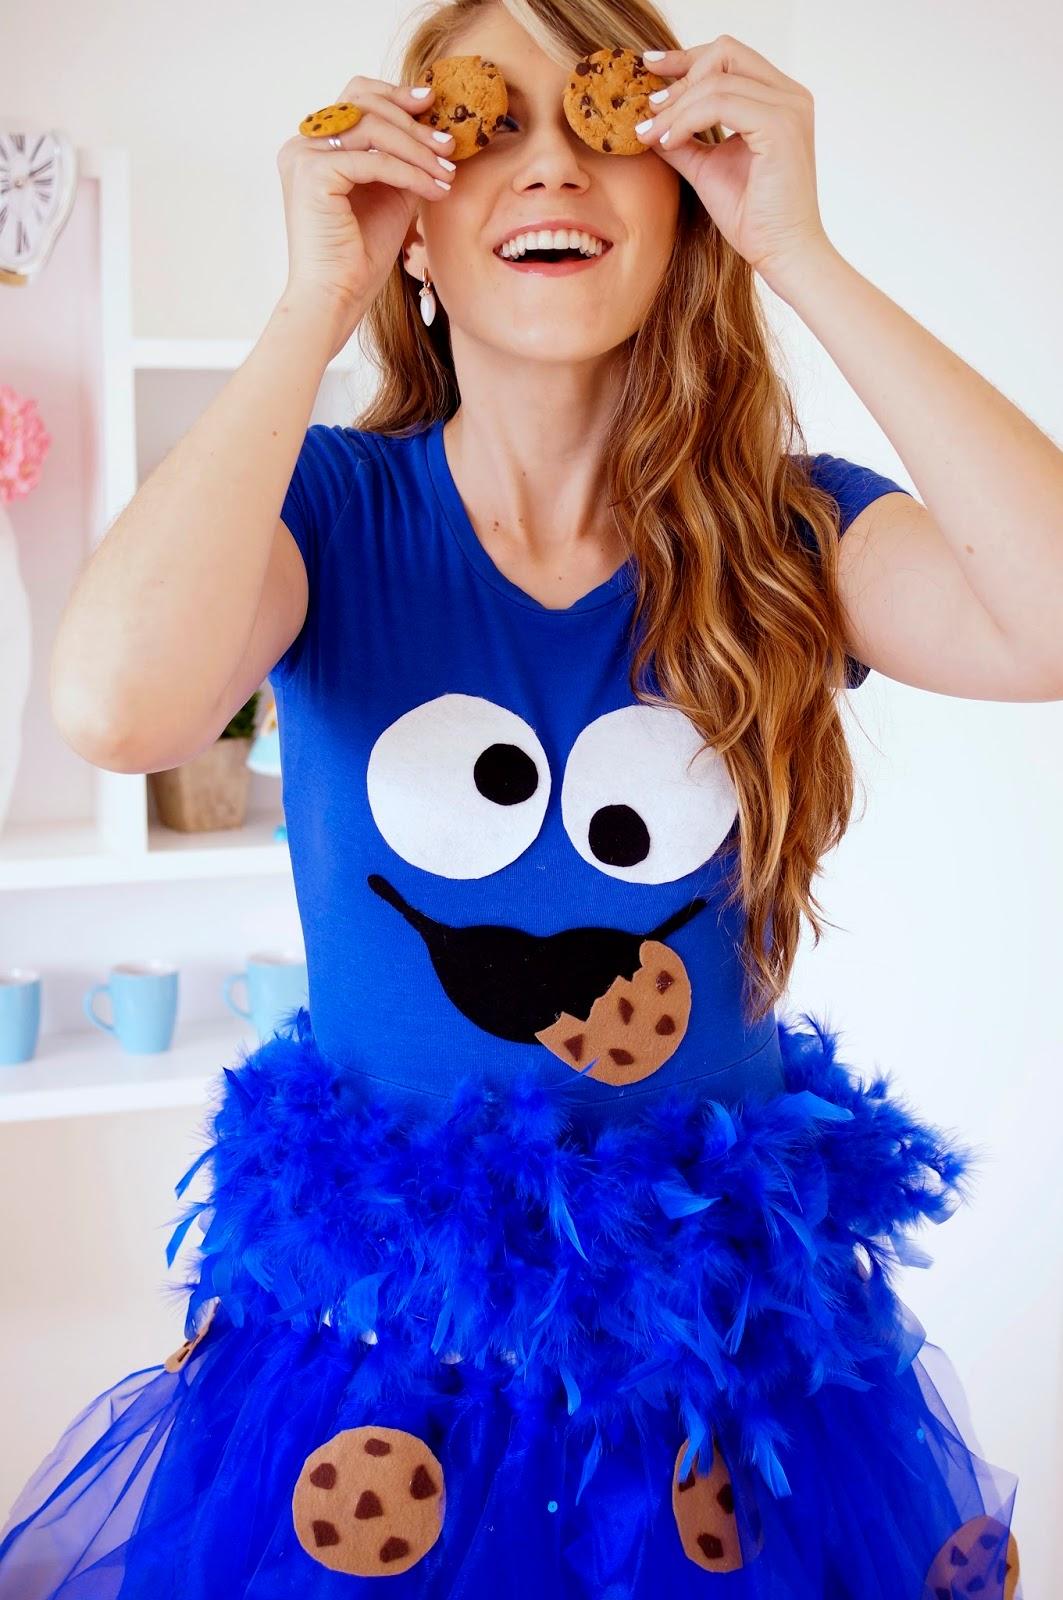 Easy Homemade Cookie Monster Costume for Halloween